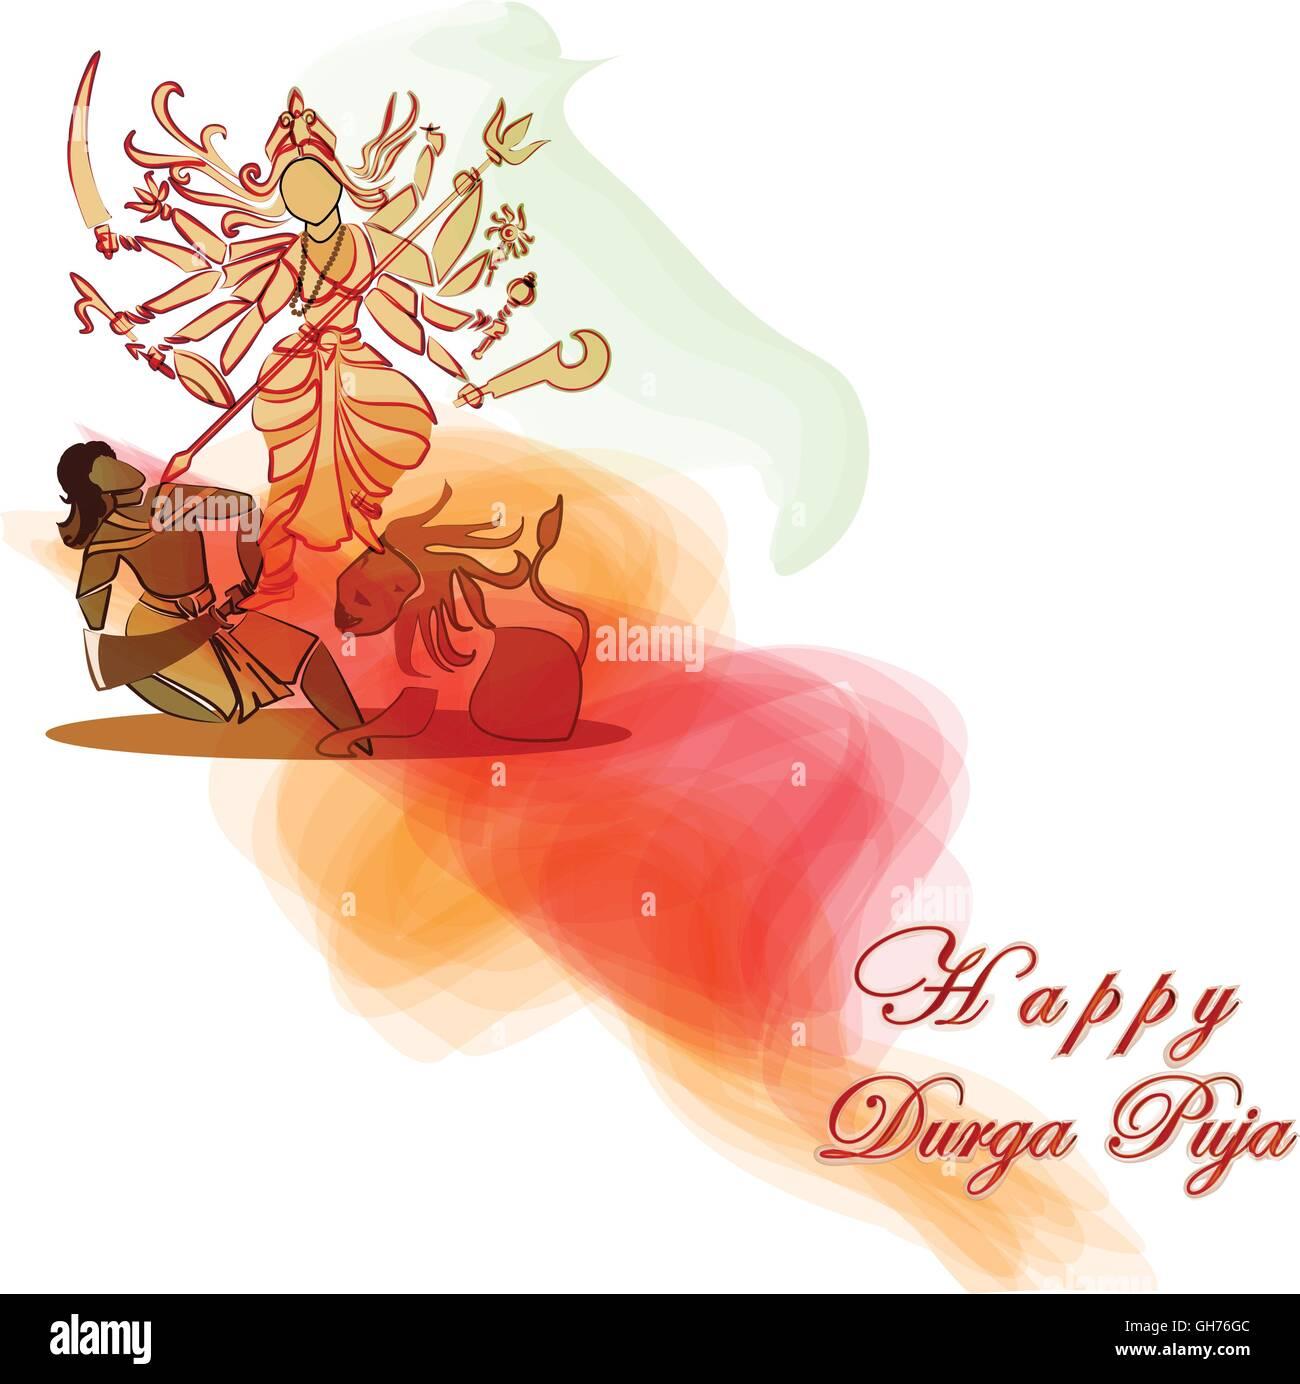 Durga Hindu Goddess With Asura In Celebration Of Durga Puja Stock